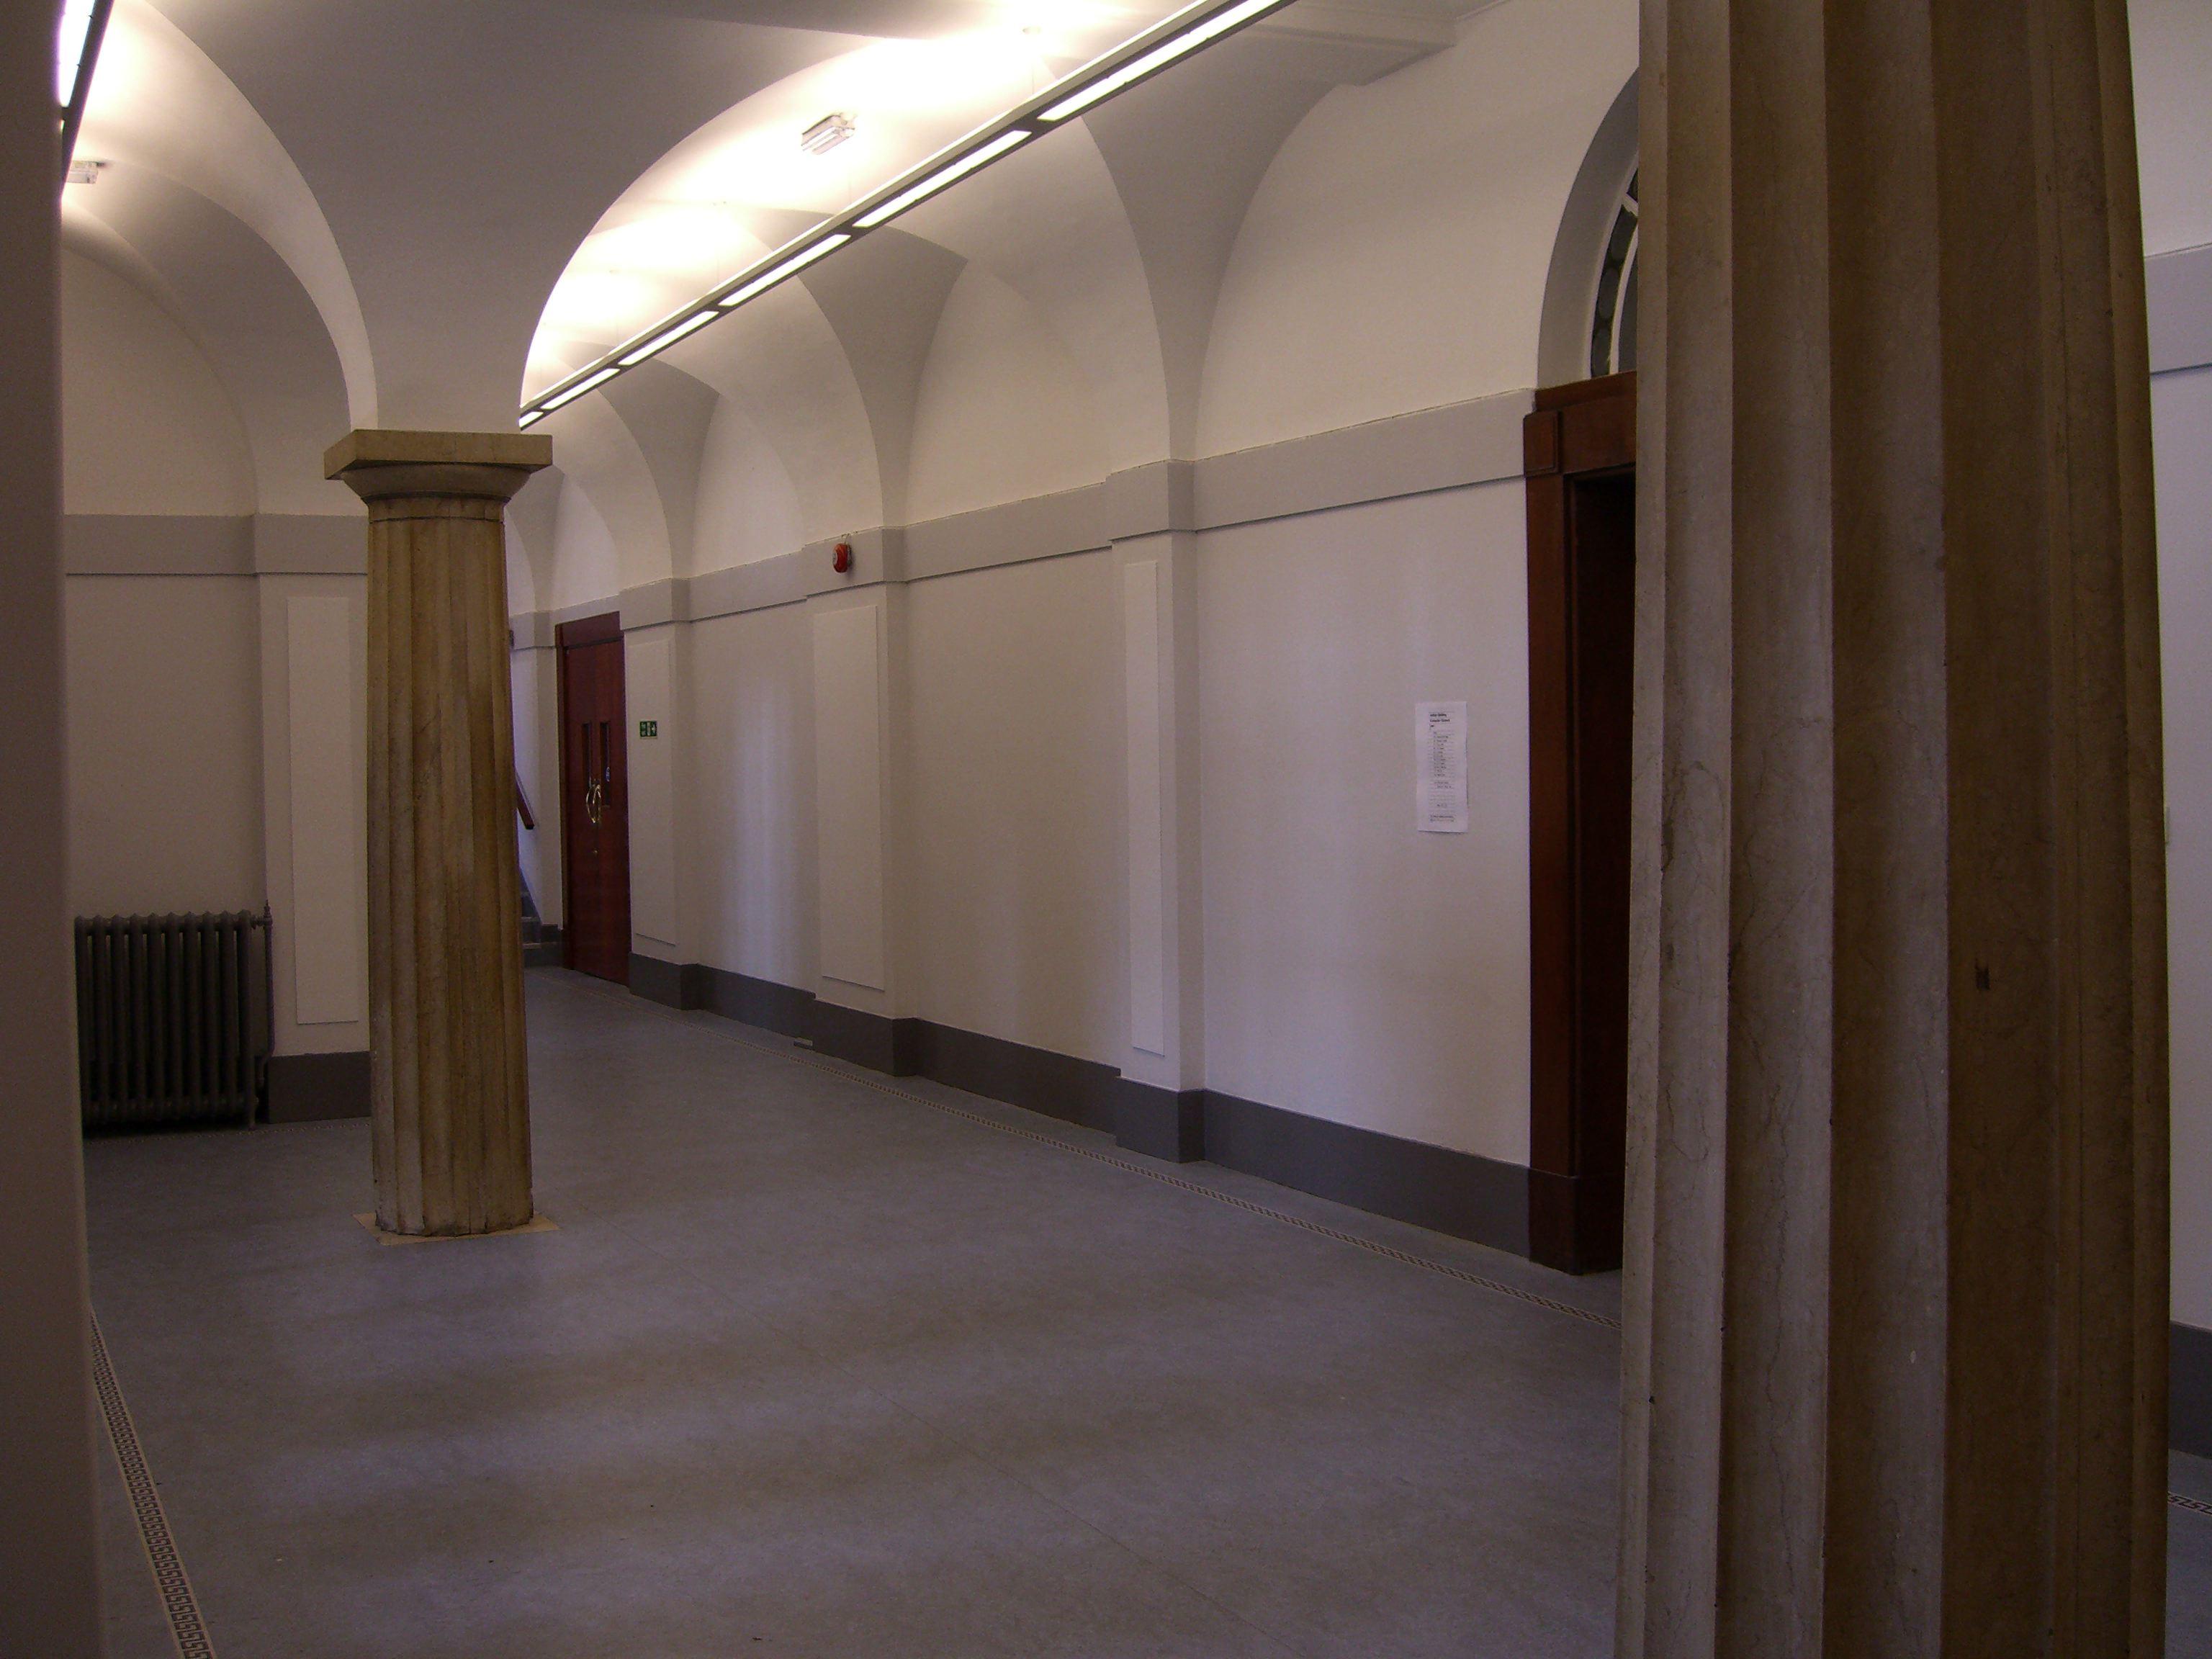 Ashton building 1st floor corridor